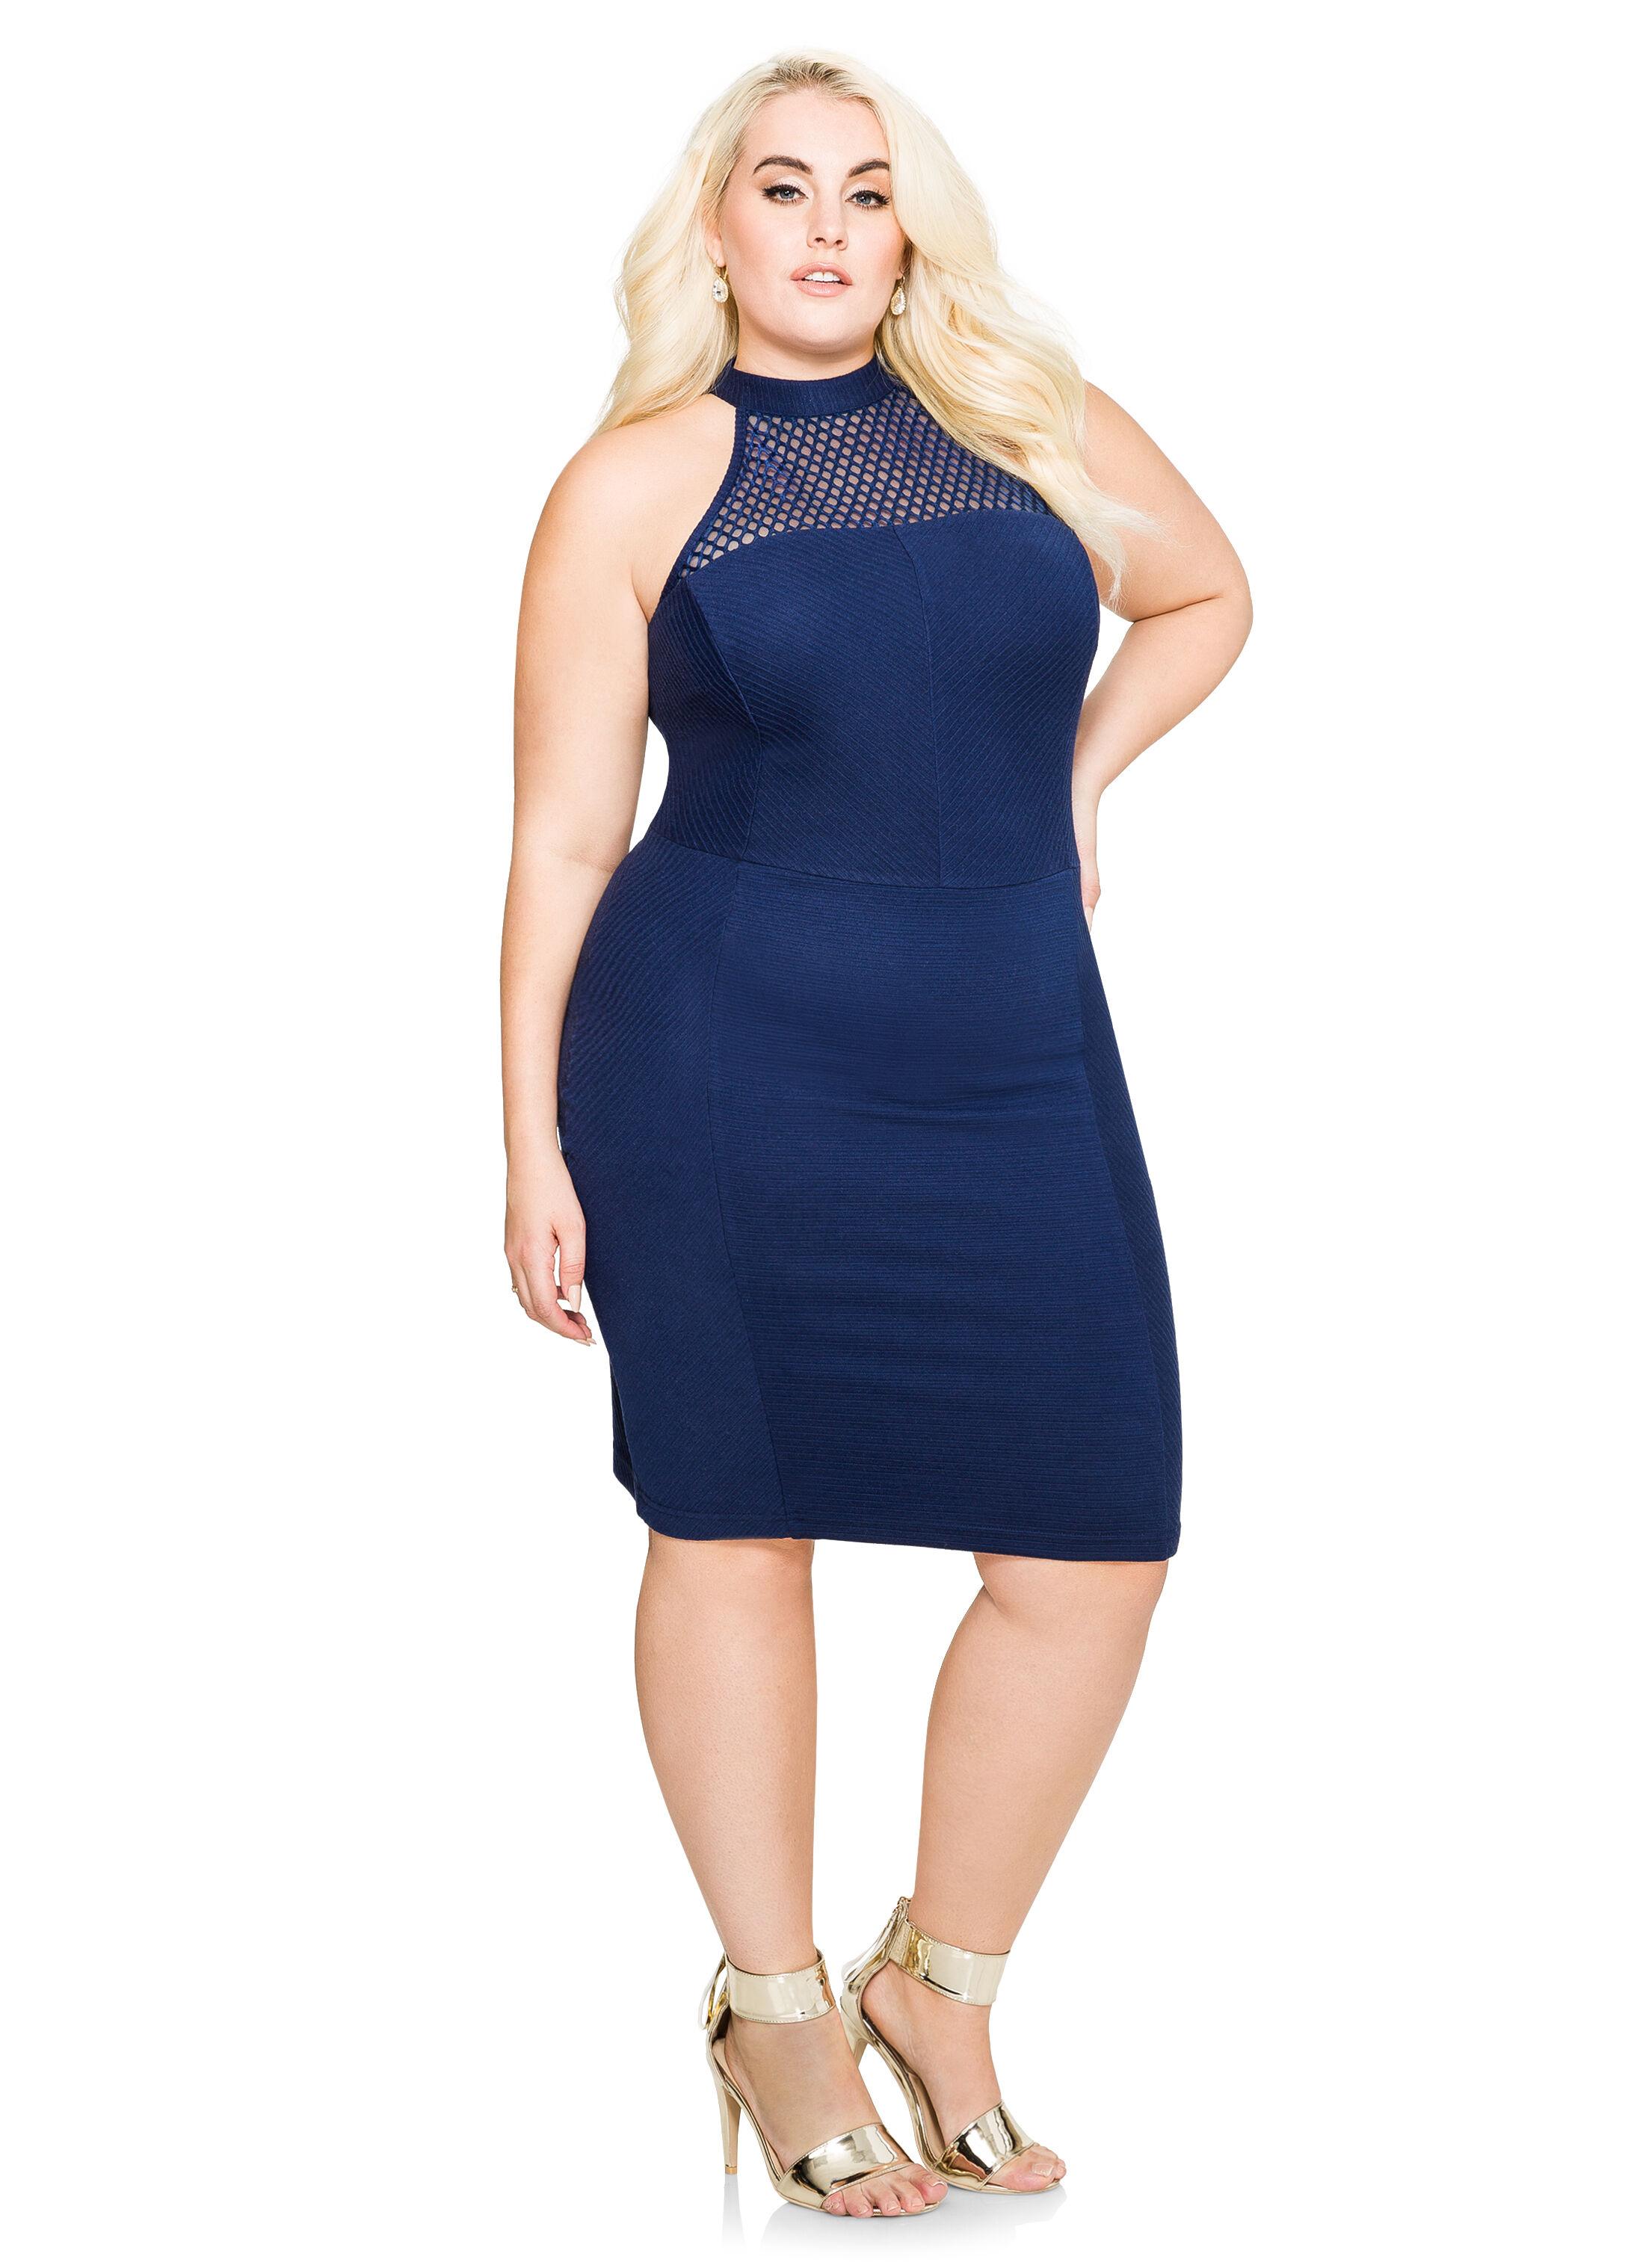 Bodycon Mesh Halter Dress